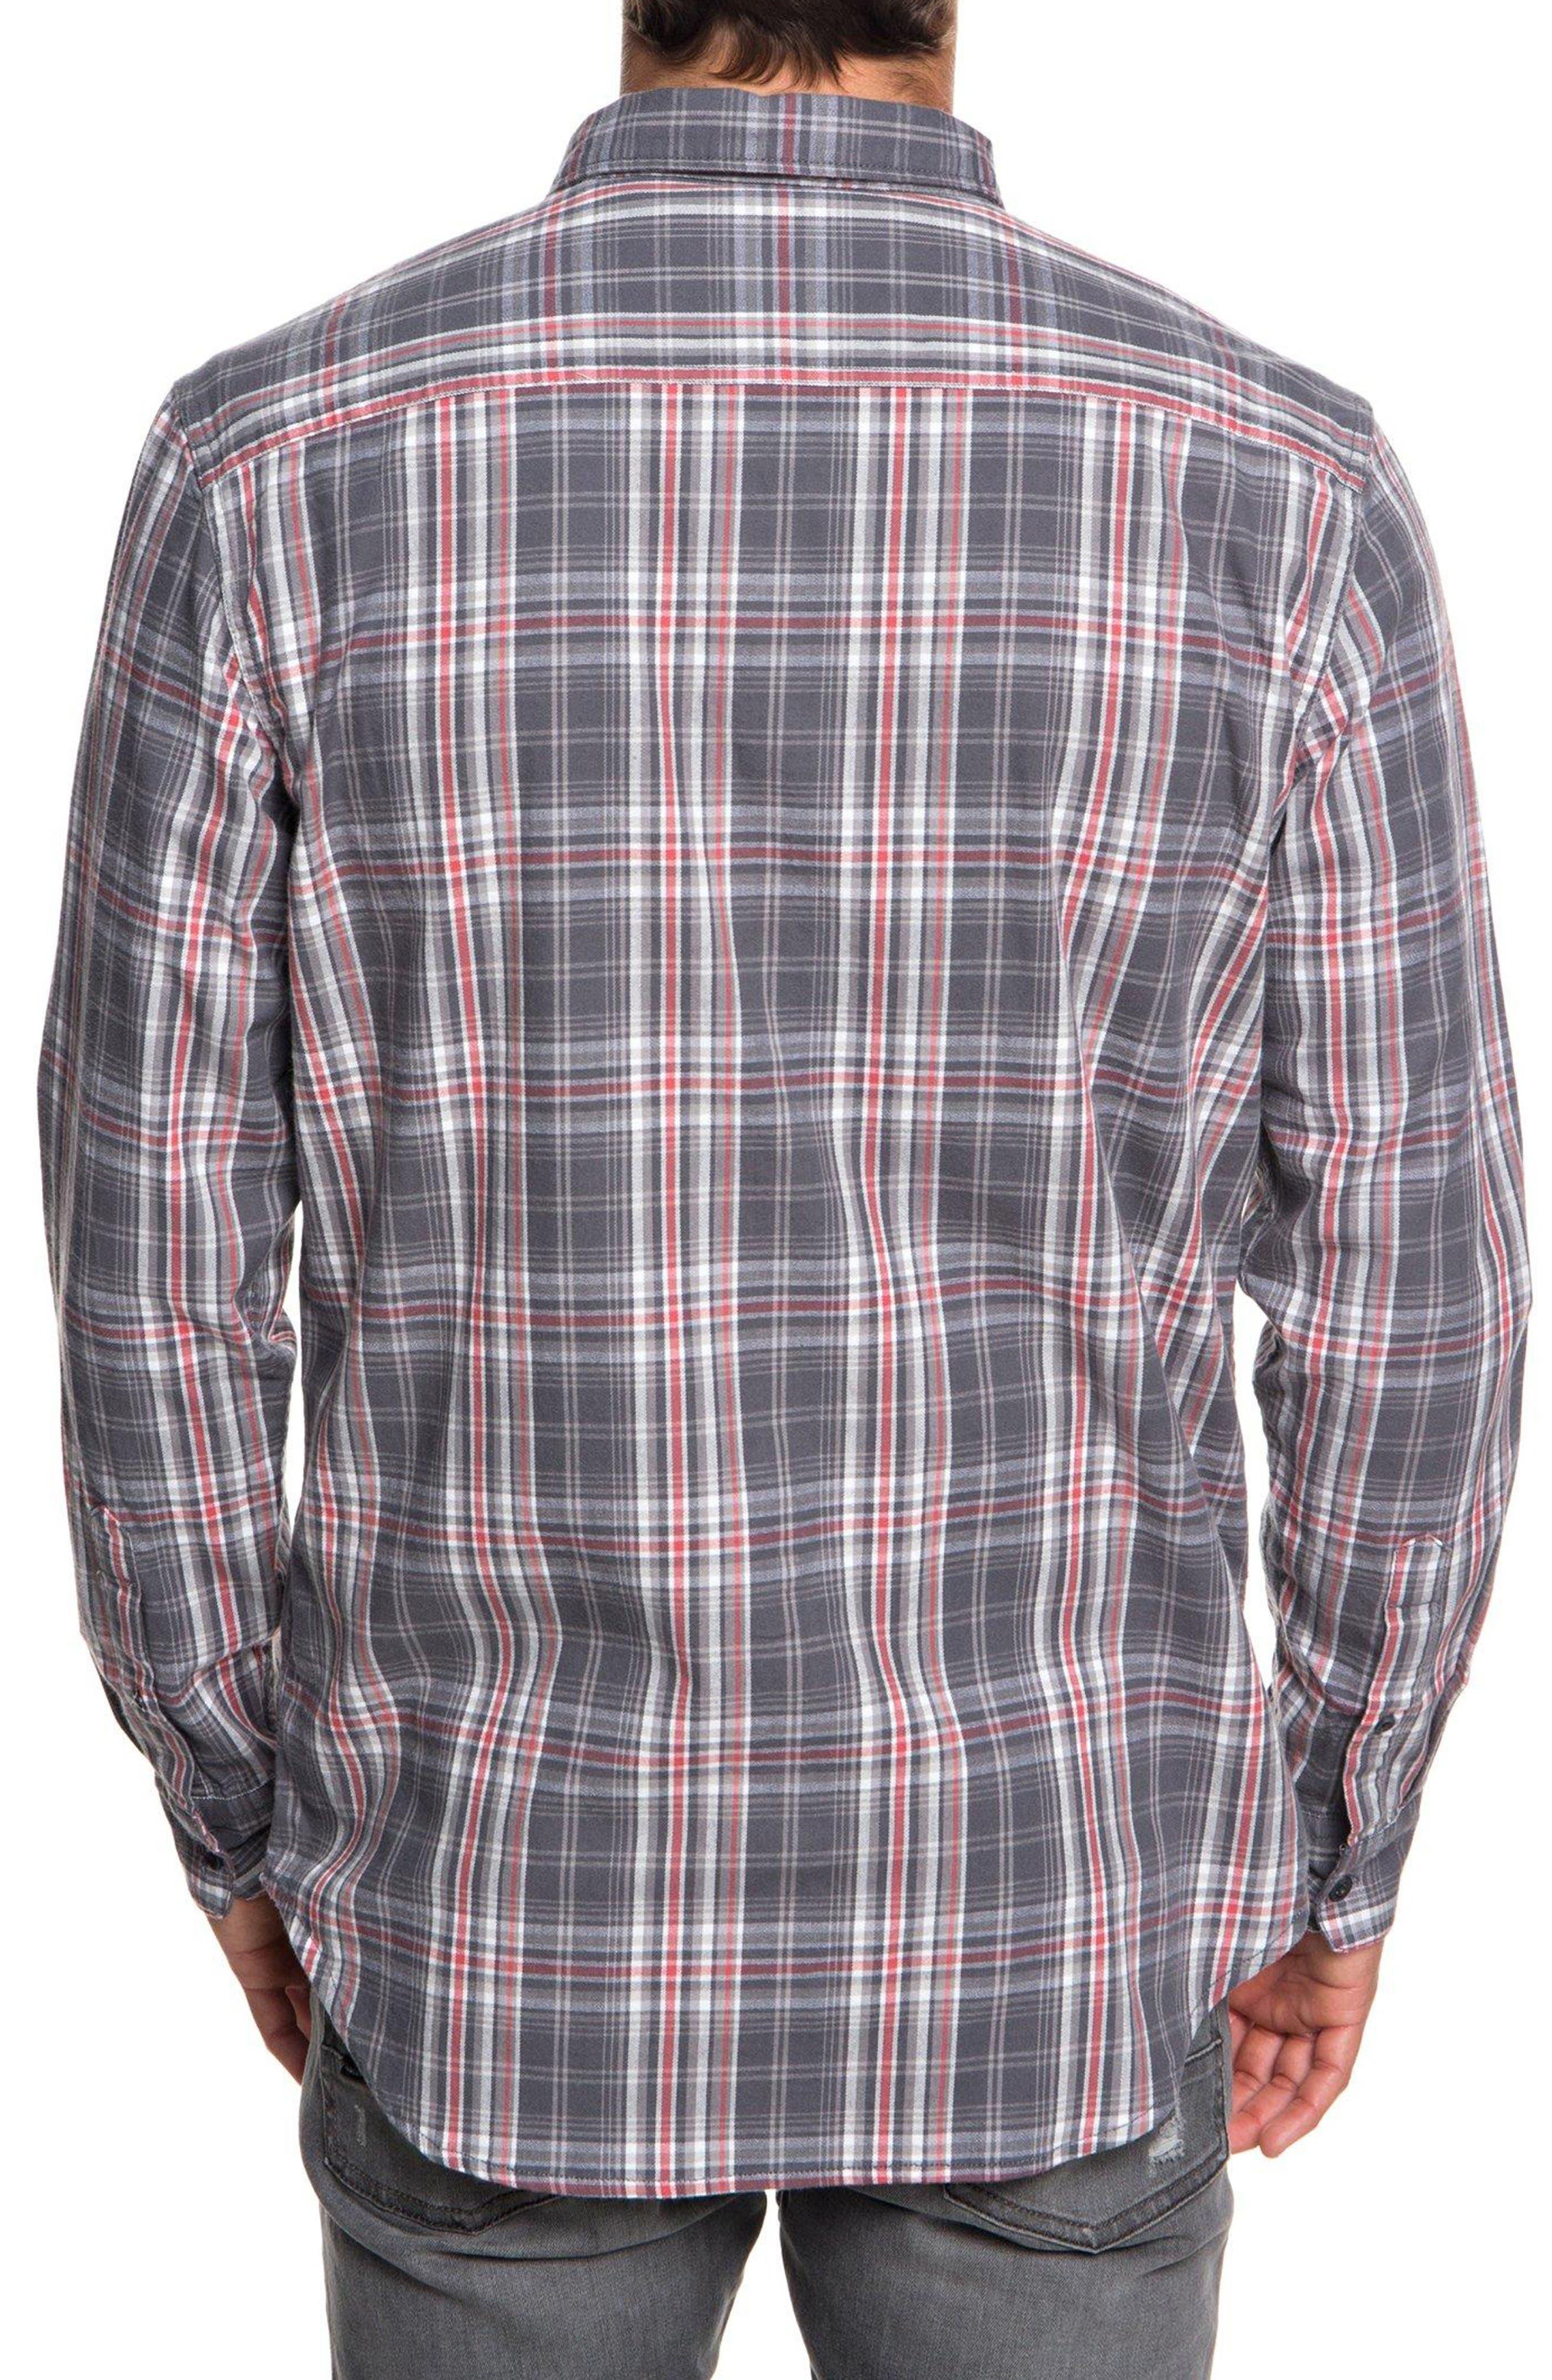 Fitz Sport Shirt,                             Alternate thumbnail 2, color,                             IRON GATE FITZ CHECK